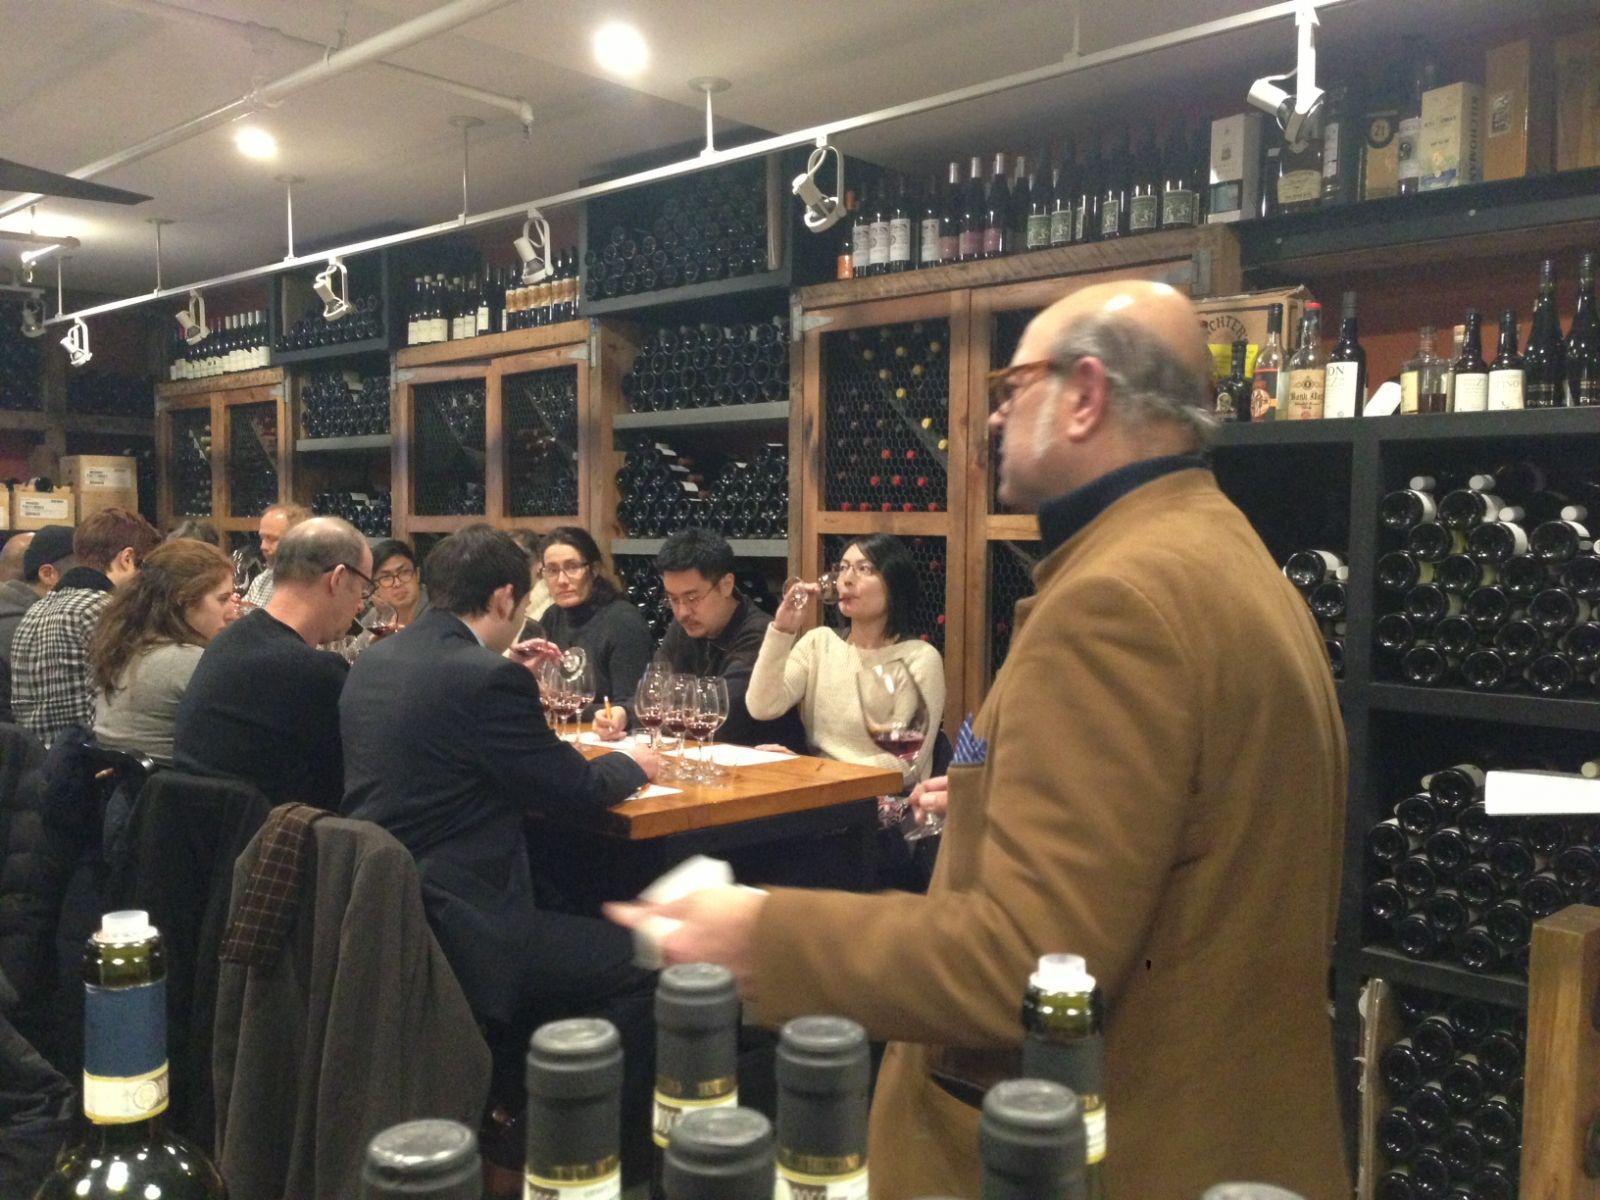 group tasting wine